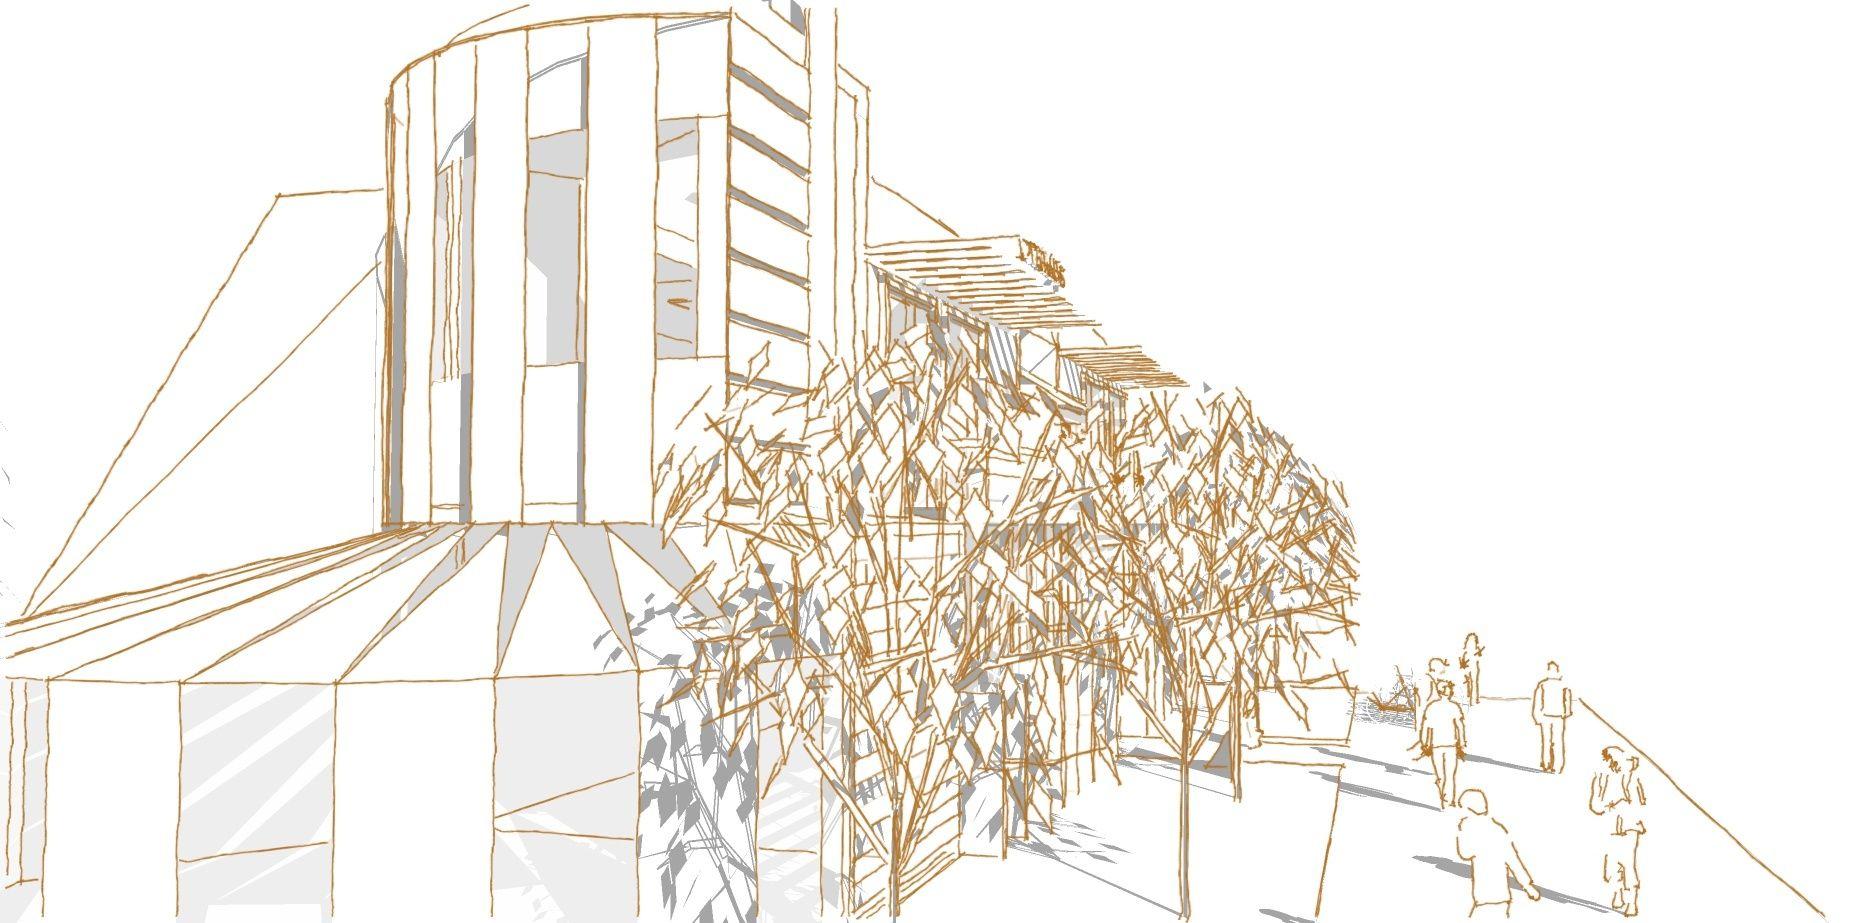 SketchUp'eur architecte -AnthO'- - Page 4 Debian15